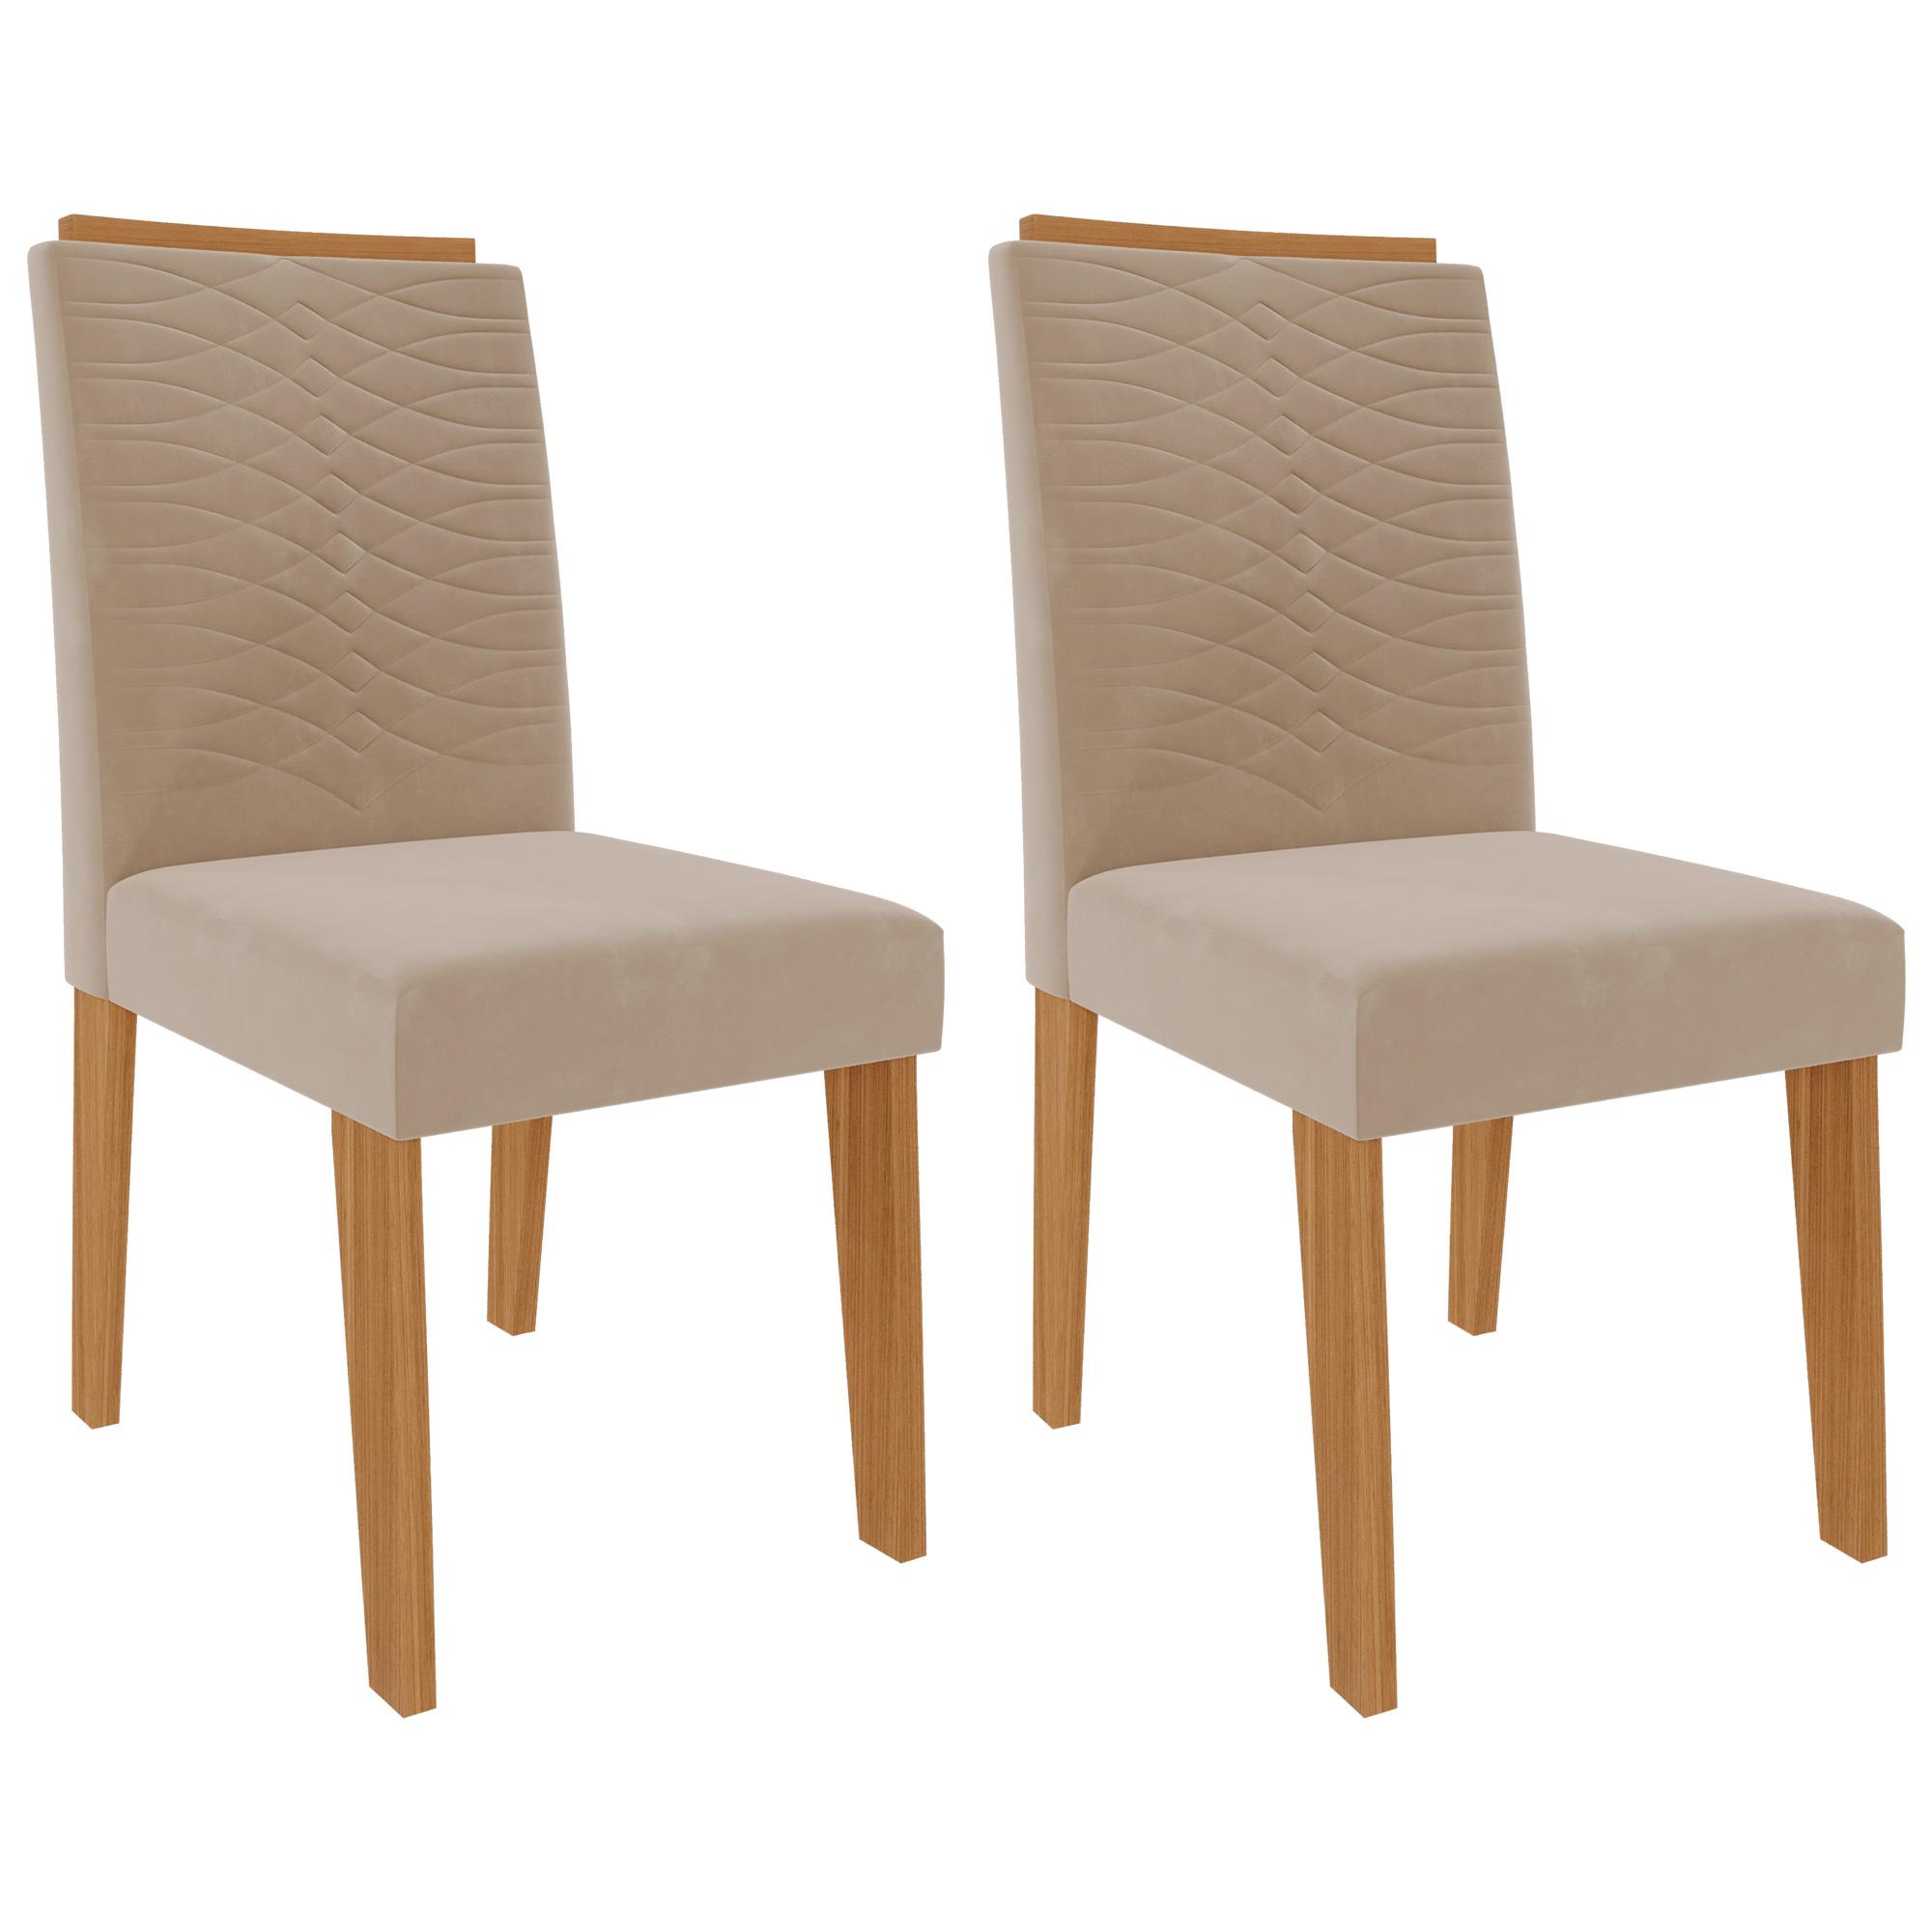 Cadeiras de MDF Para Sala de Jantar 02 Pçs Clarice  Cimol Nature/Nude